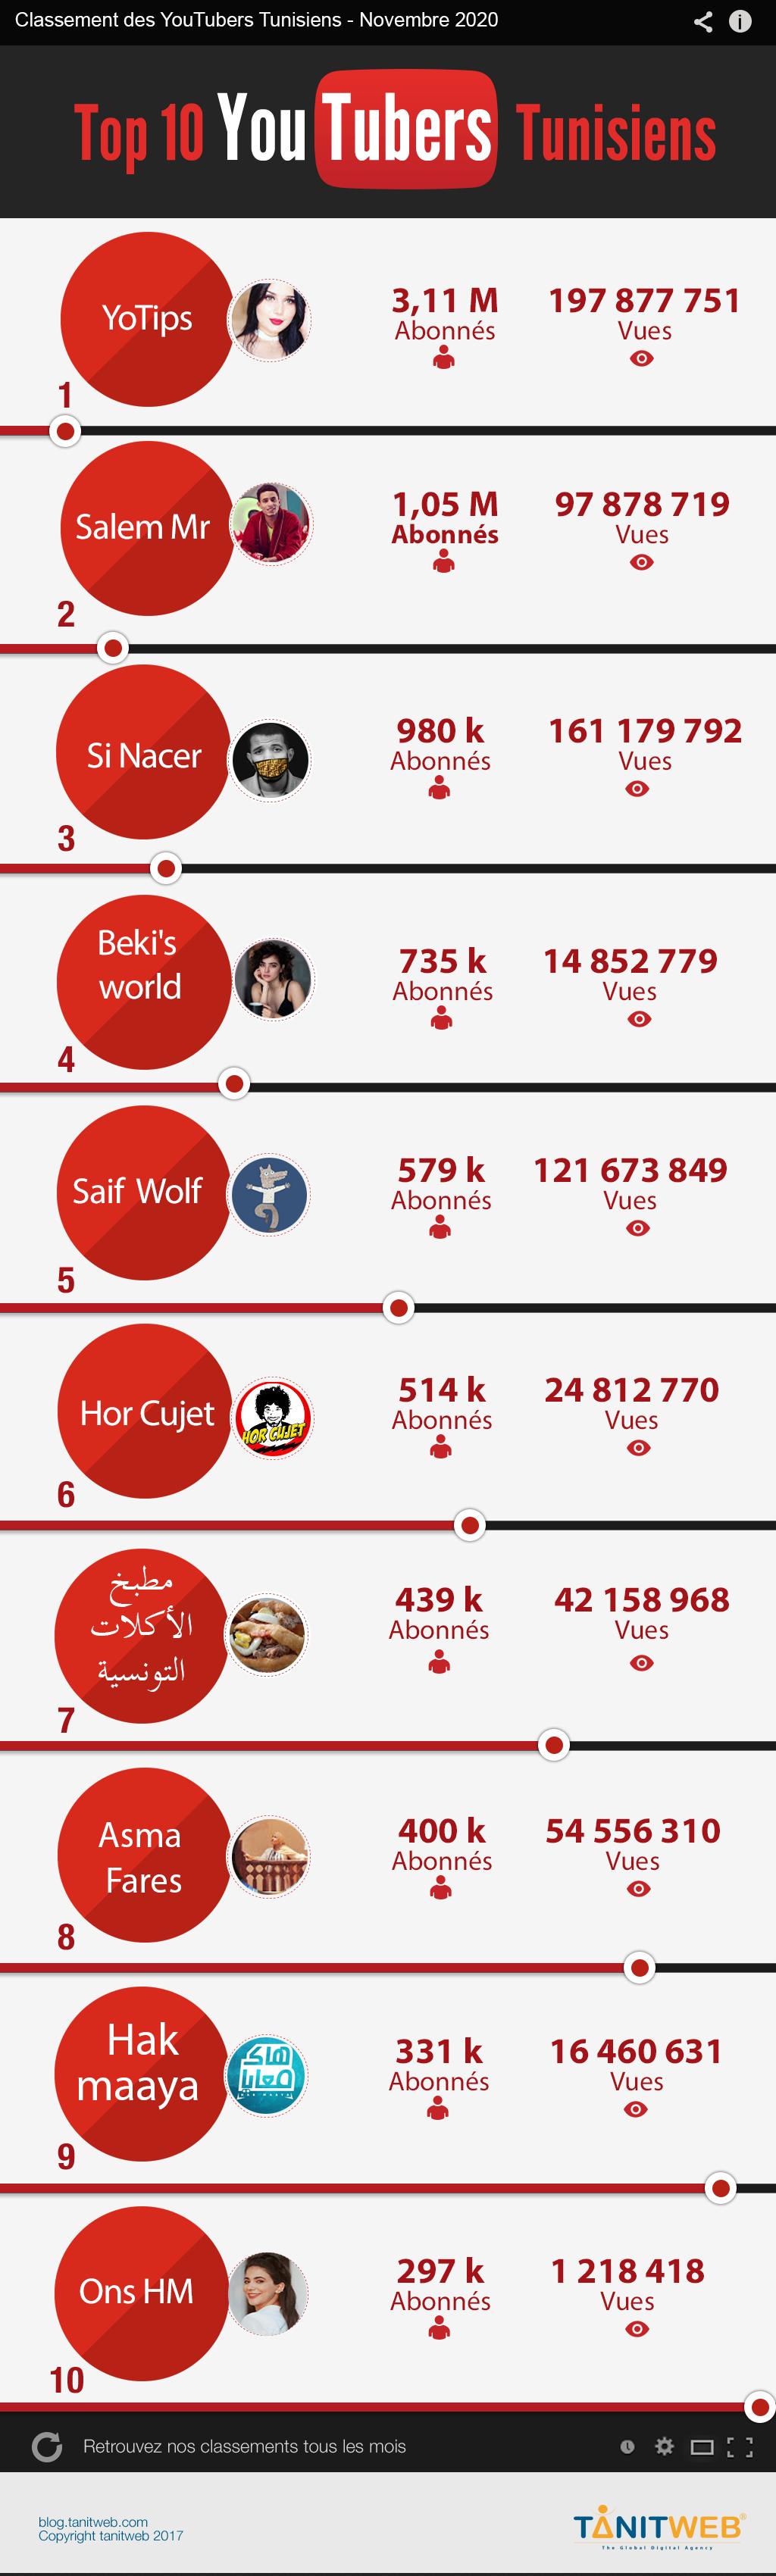 YouTubers-Tunisiens-novembre-2020